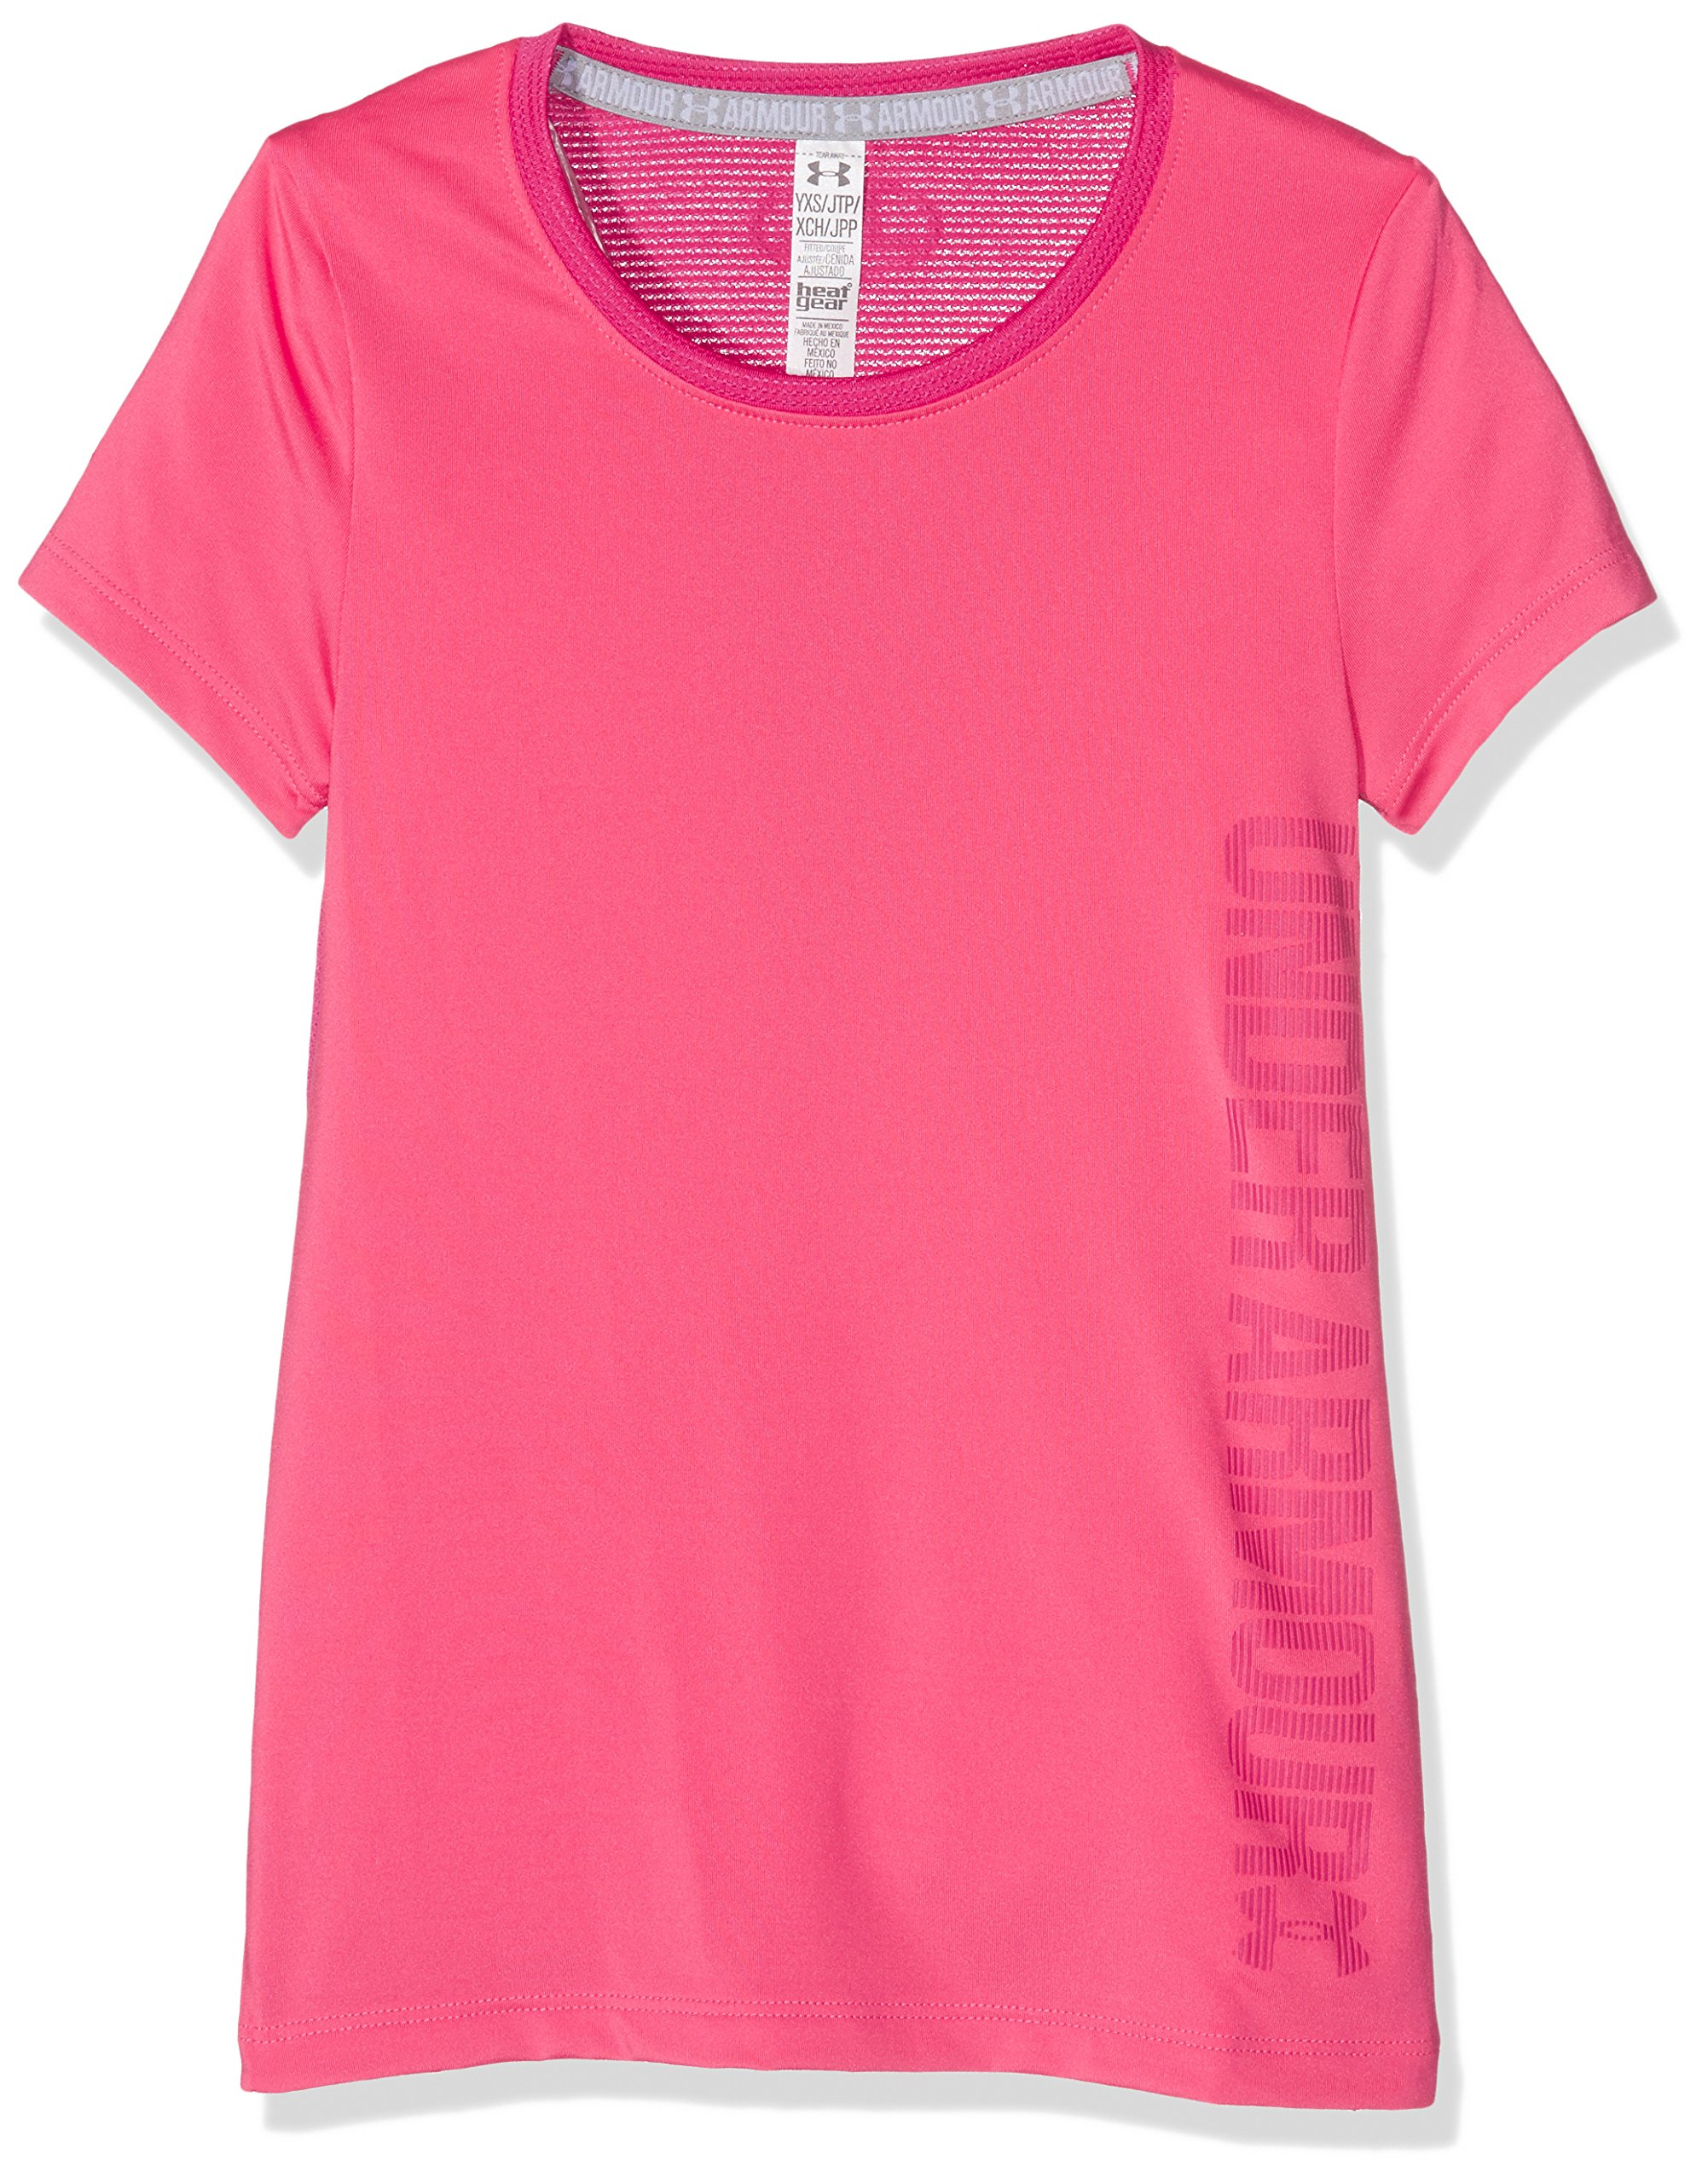 Under Armour Girls' Armour Short Sleeve Shirt, Gala /Honeysuckle, Youth X-Small